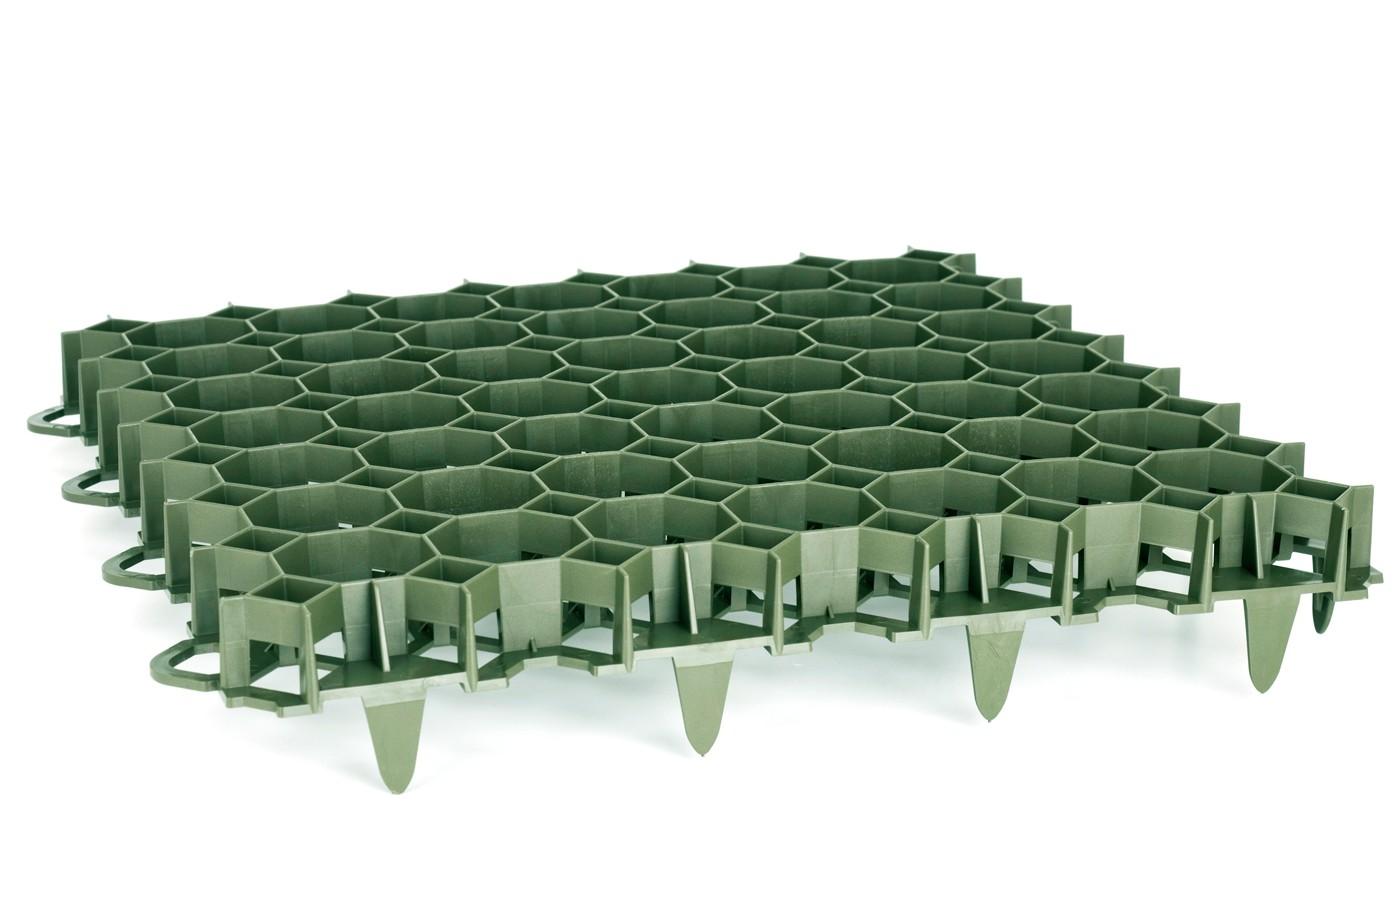 dalle engazonner 50 x 50 cm p 3 9 3 5 t. Black Bedroom Furniture Sets. Home Design Ideas